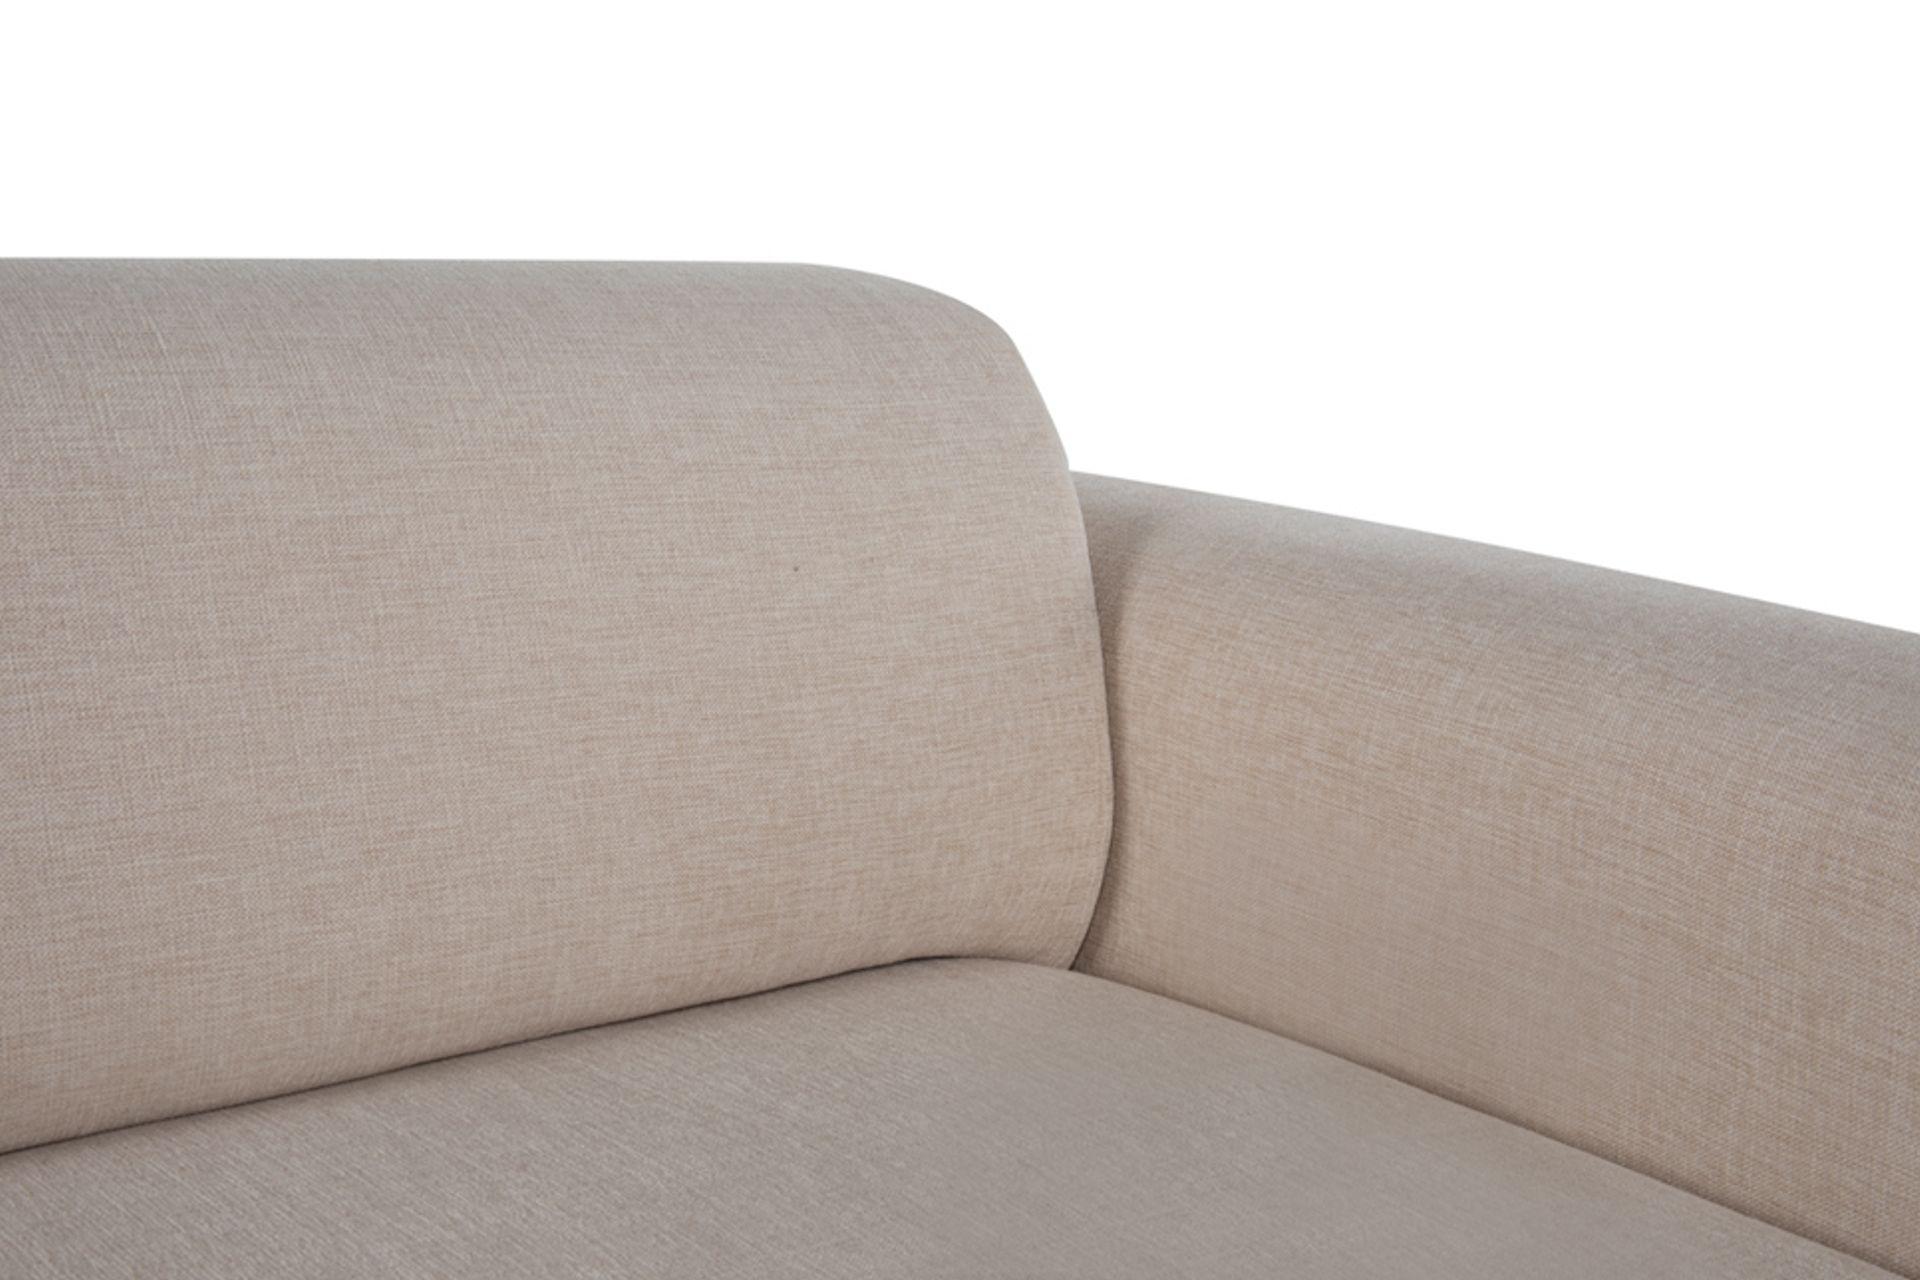 Softy Three Seater Sofa Bed, Beige